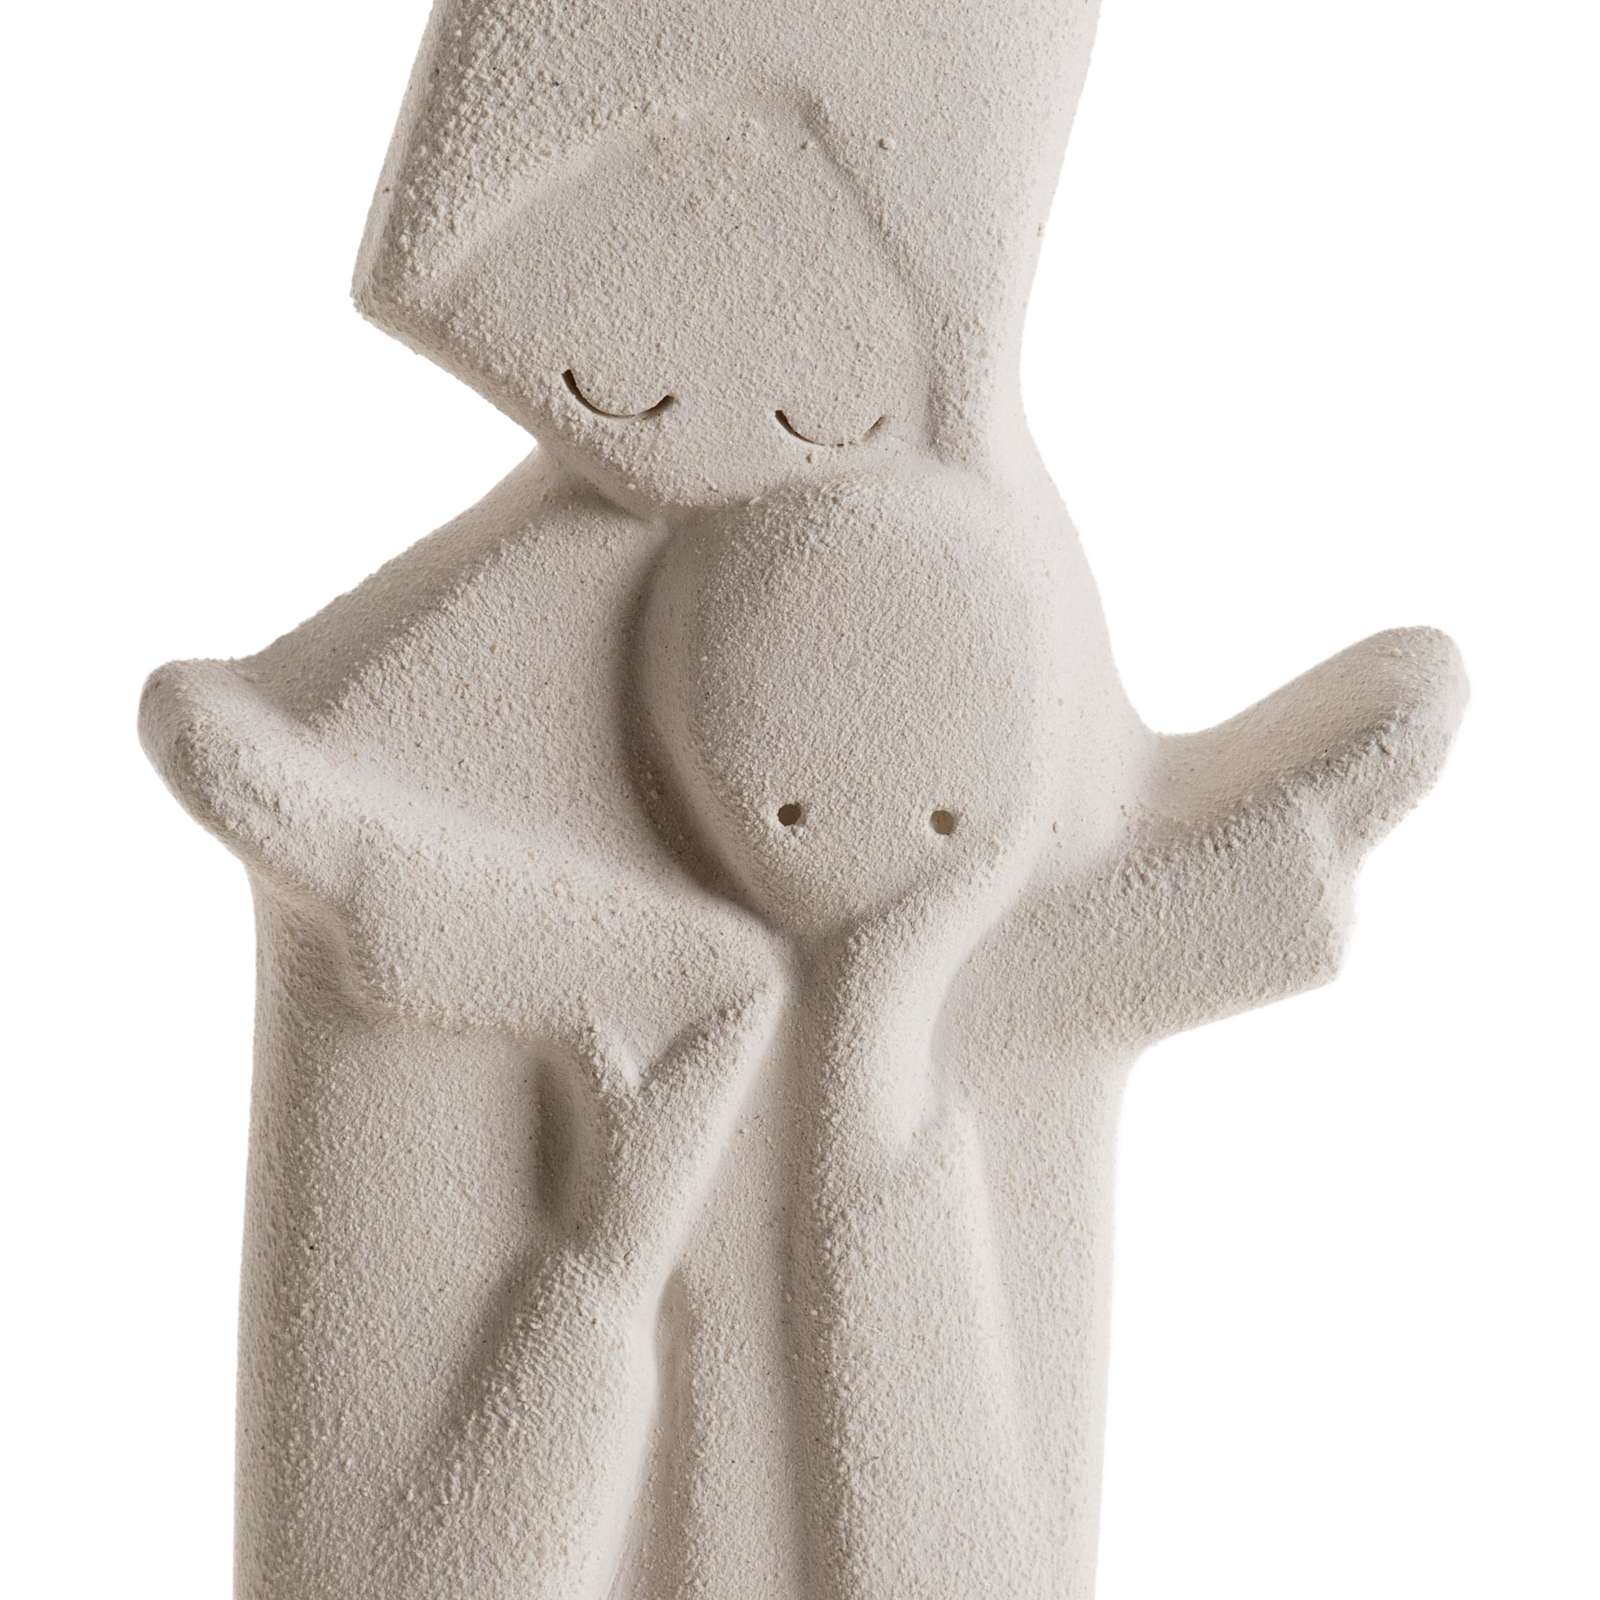 Madonnina Gen da appendere ceramica 4